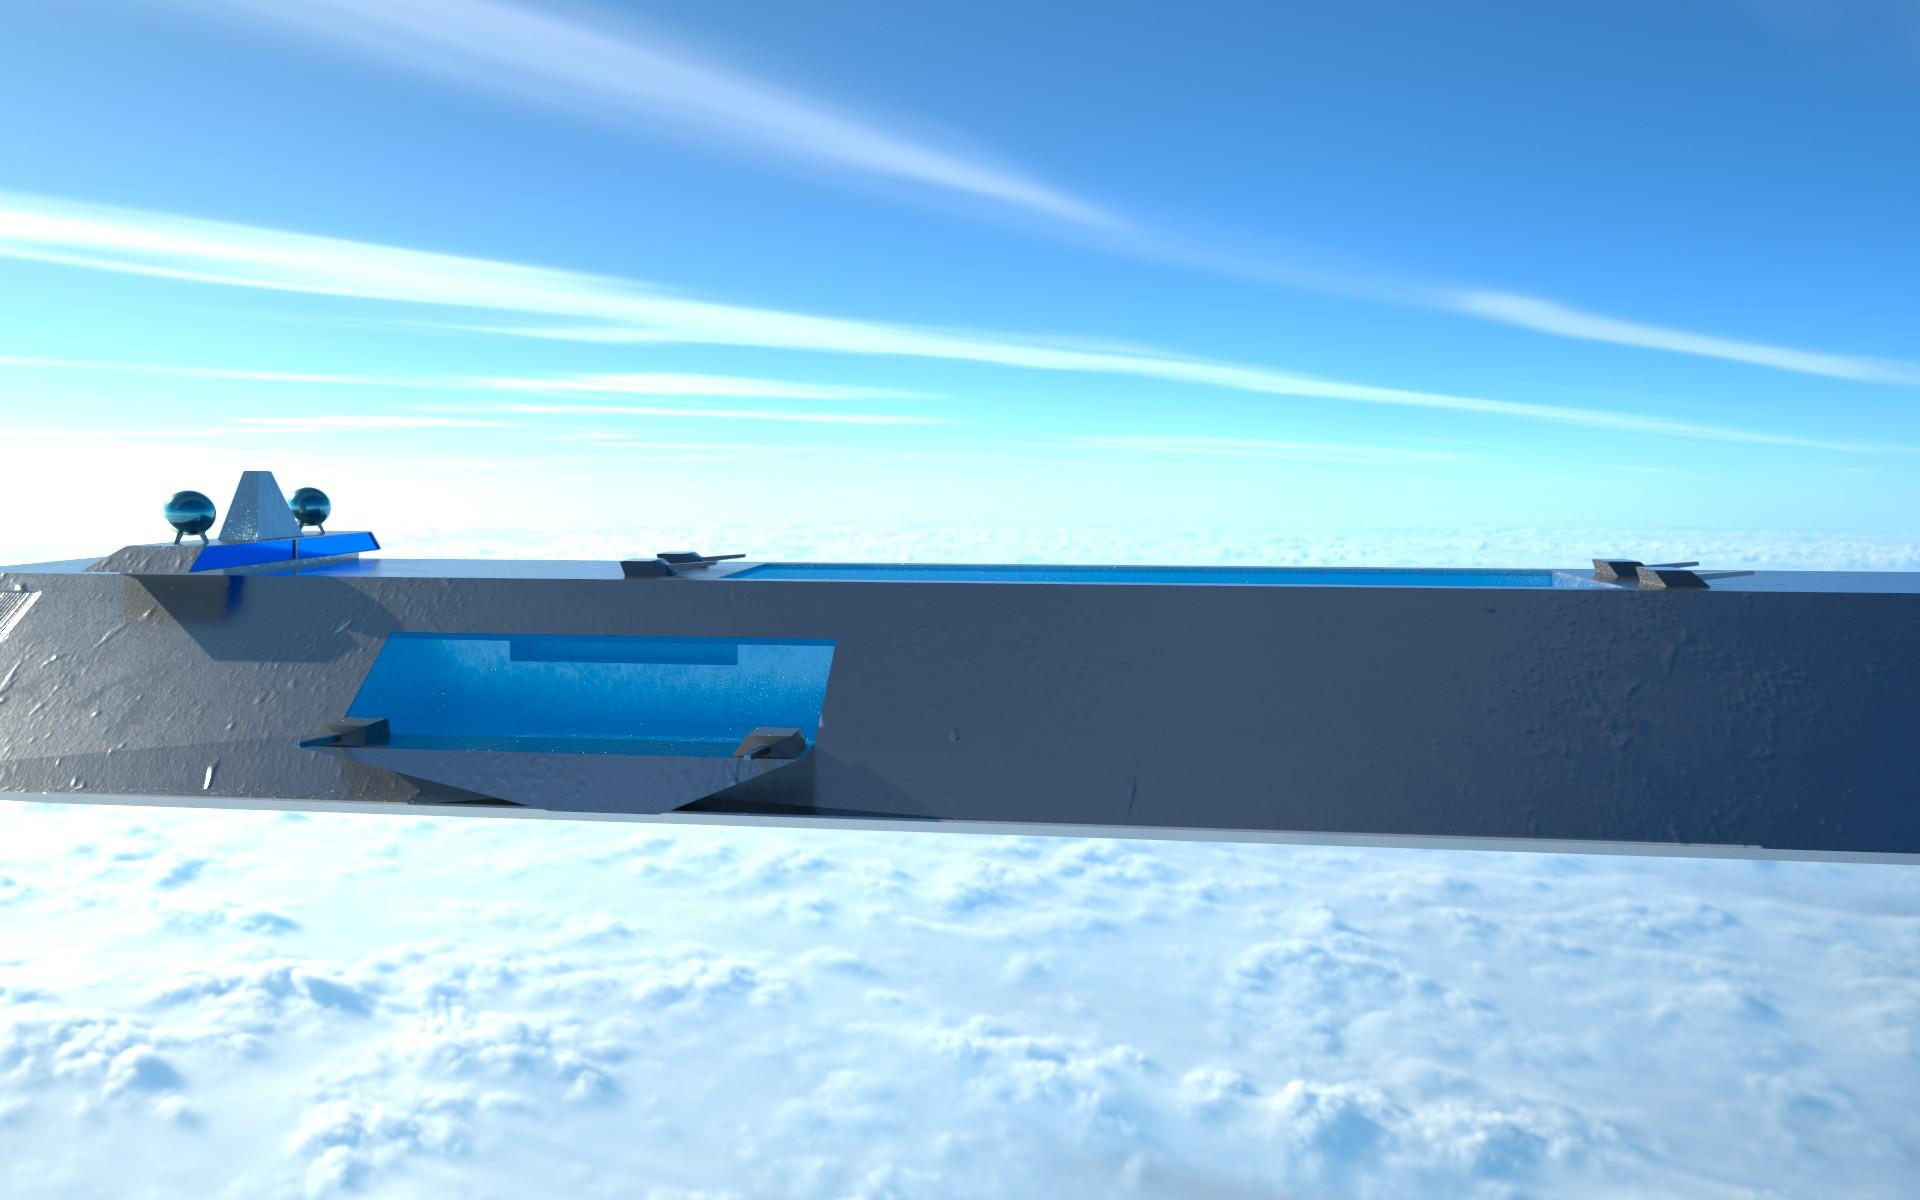 Astromech Carrier 2 by planetrix15